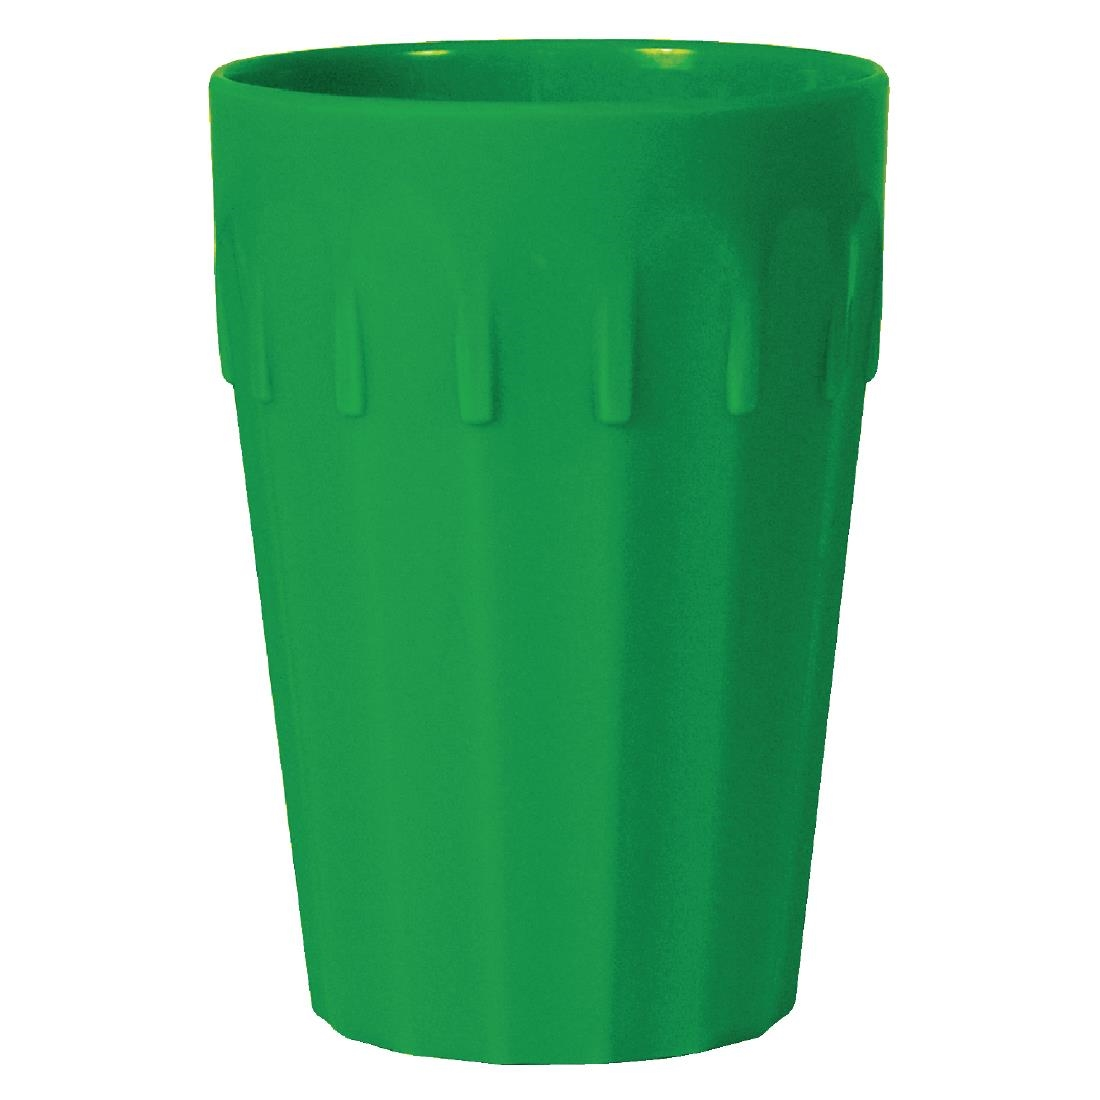 Tumbler - Green